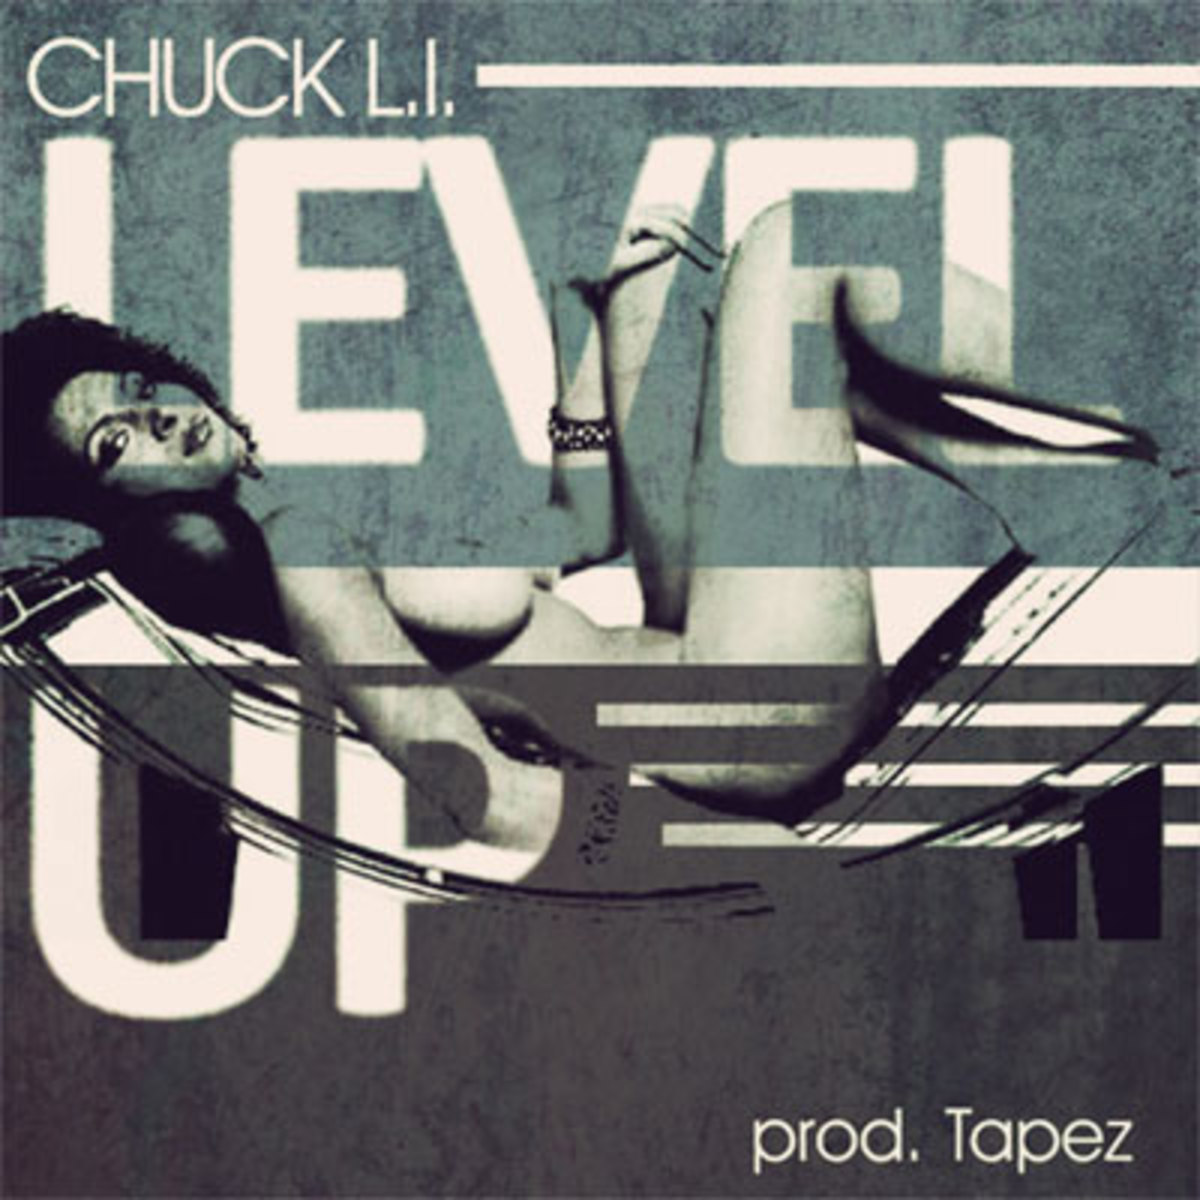 chuckli-levelup.jpg